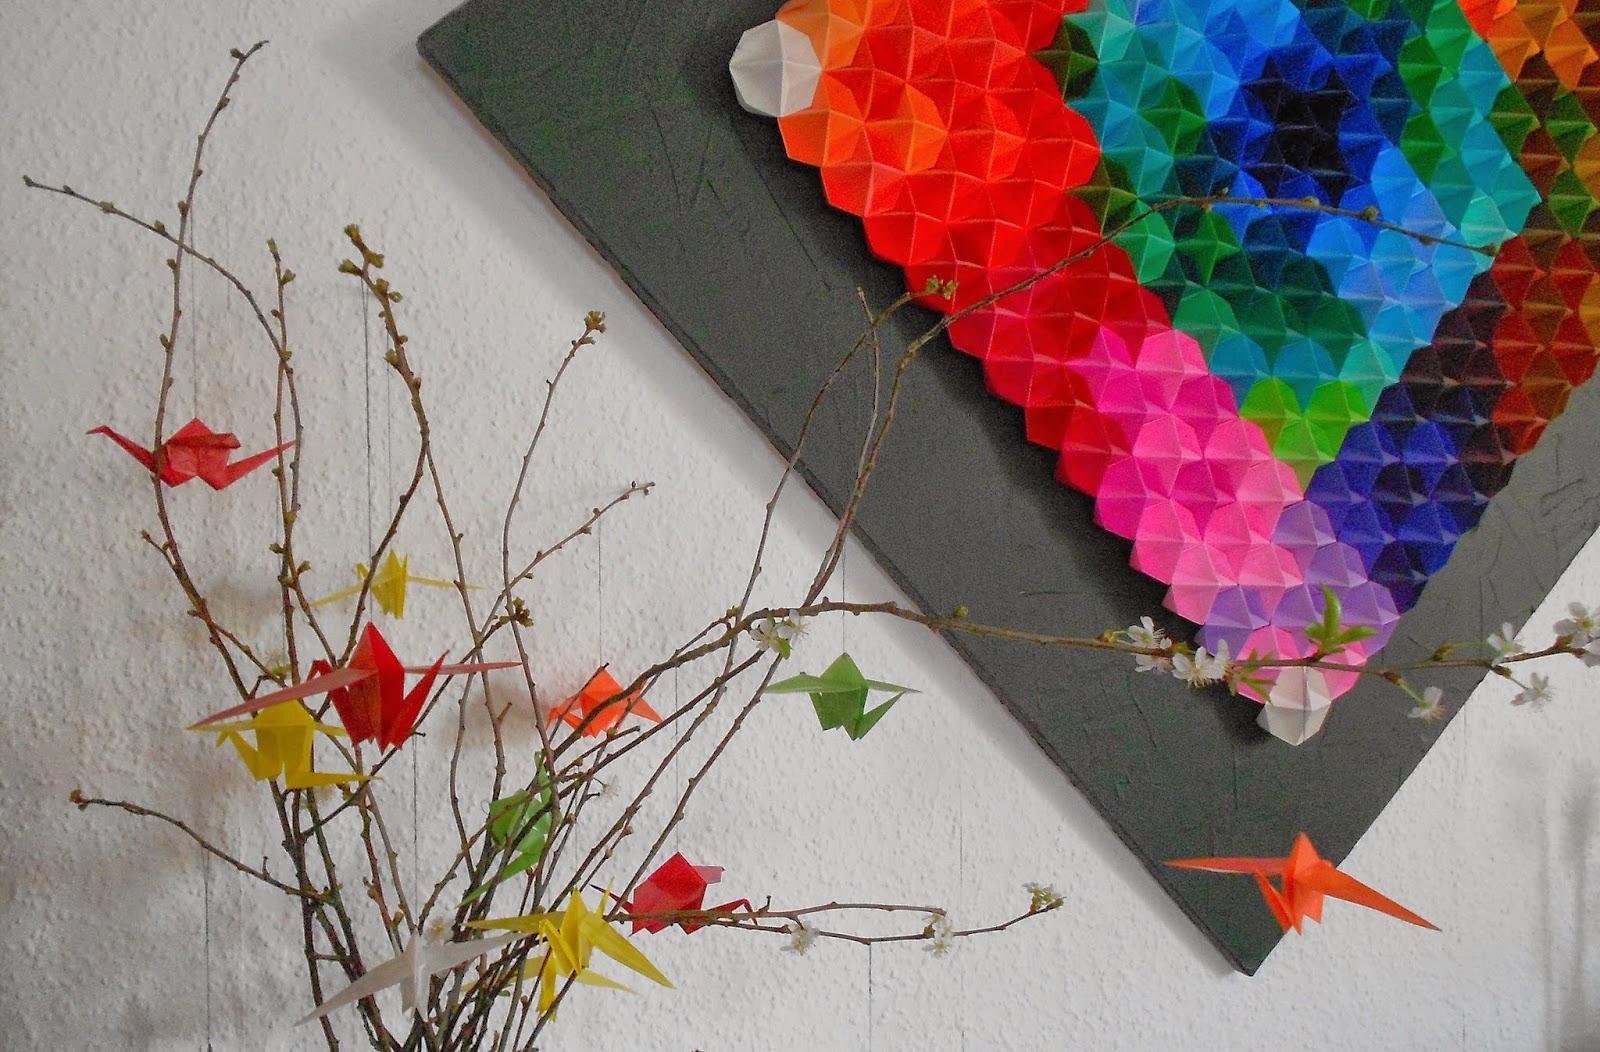 Frühlingsdeko Teil 2: Origami-Kraniche aus Transparentpapier